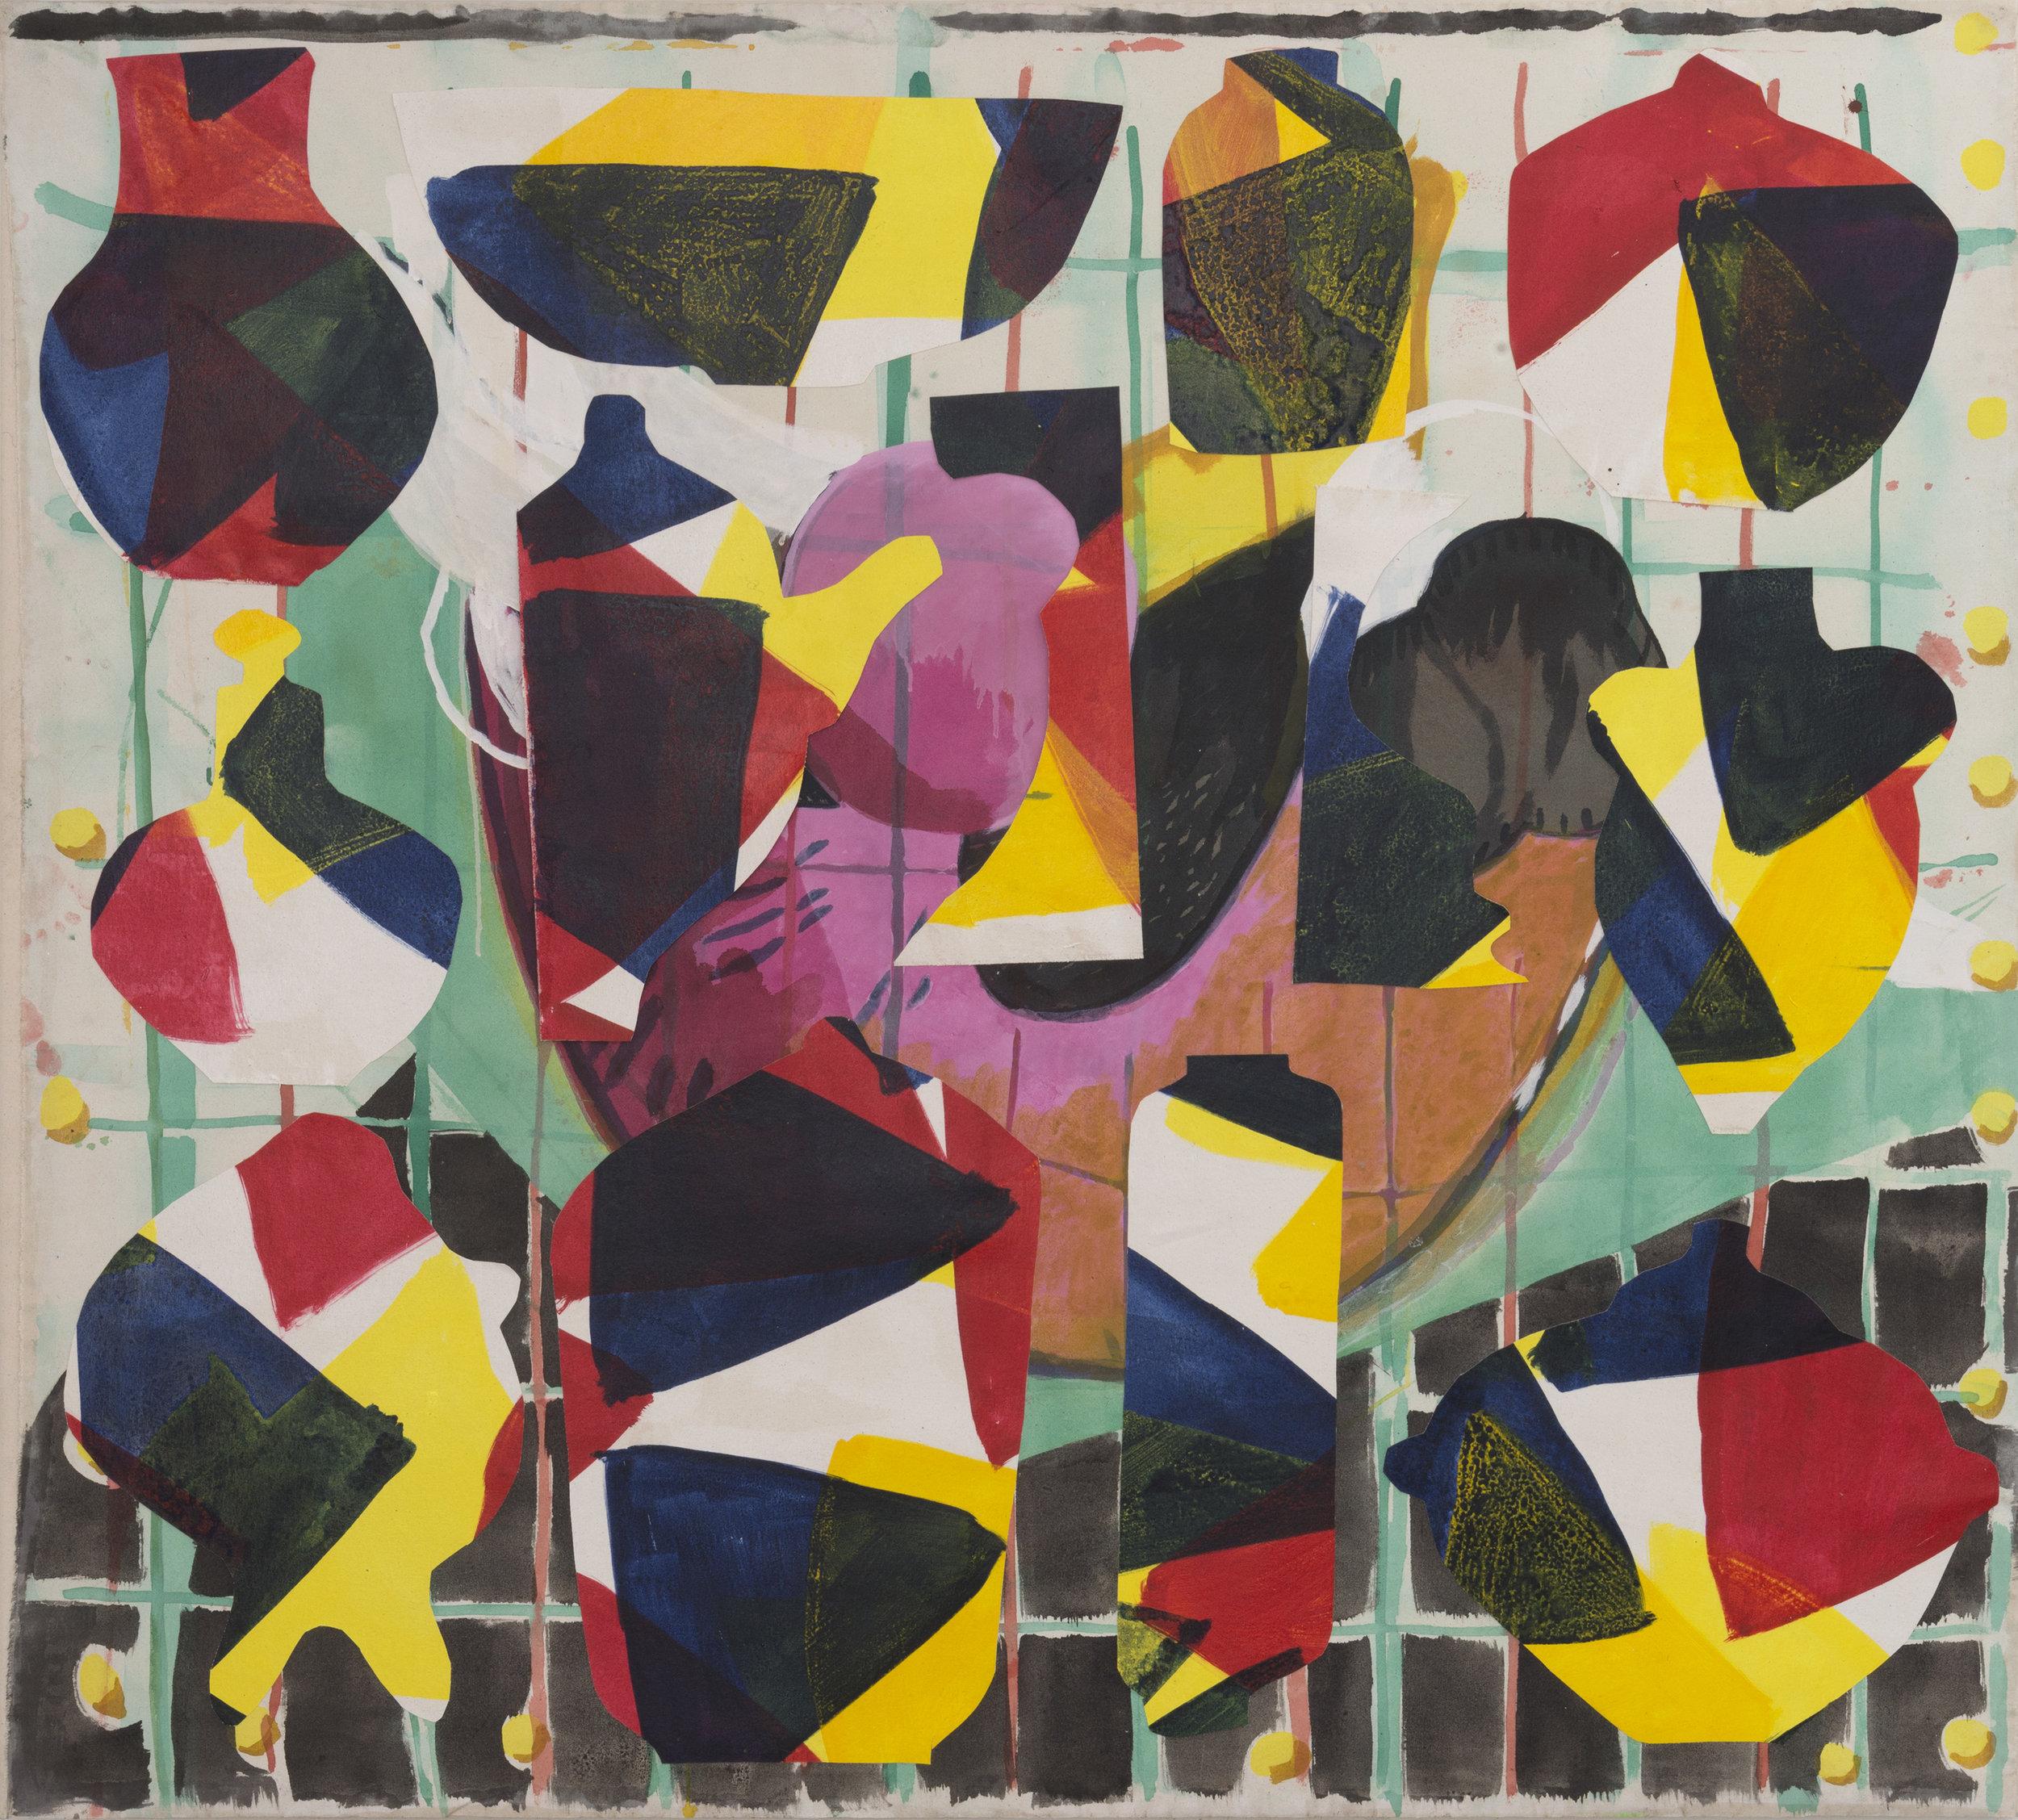 September 5, 2016 / Acrylic, Glue, Canvas / 67 1/2 x 62 inches